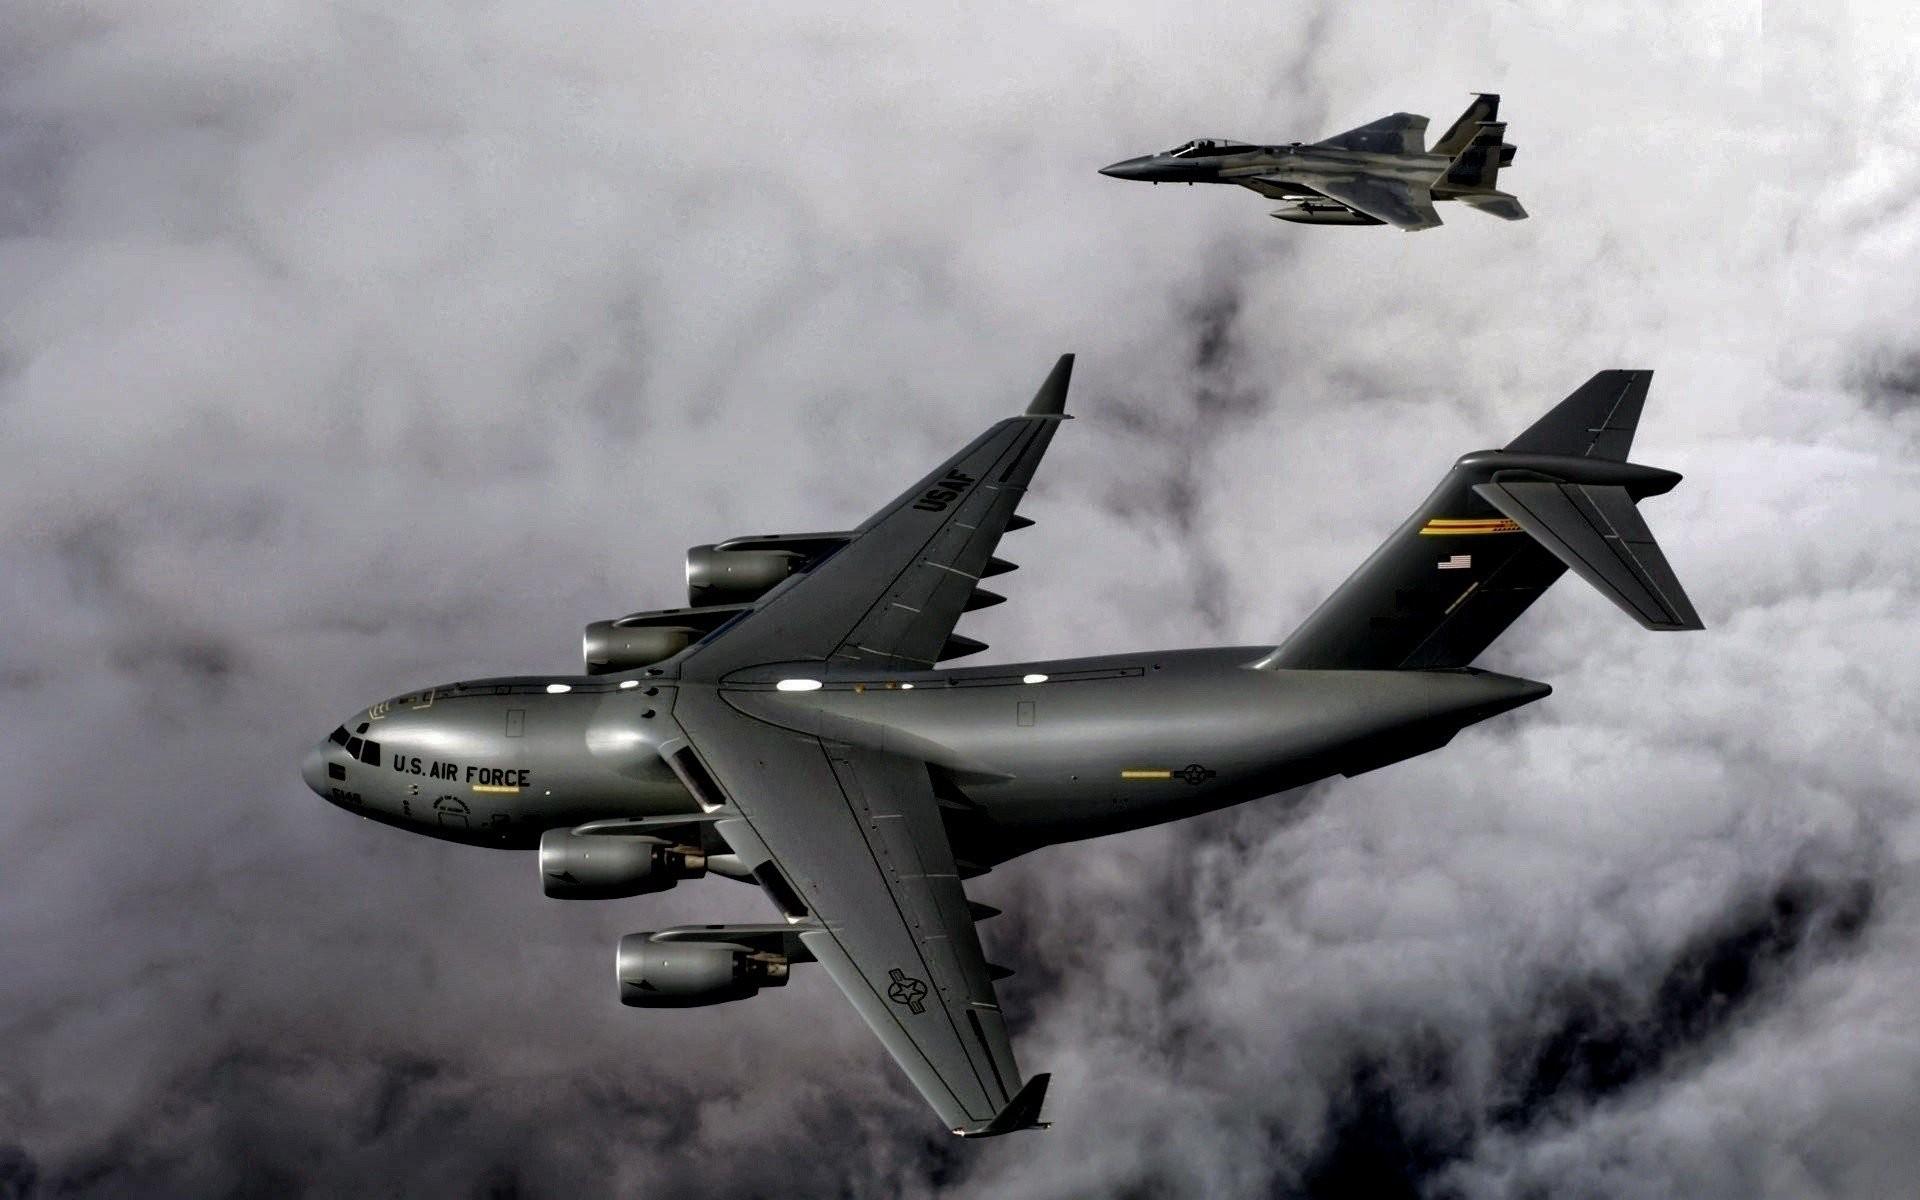 Aircraft US Air Force F-15B C-17 Globmaster